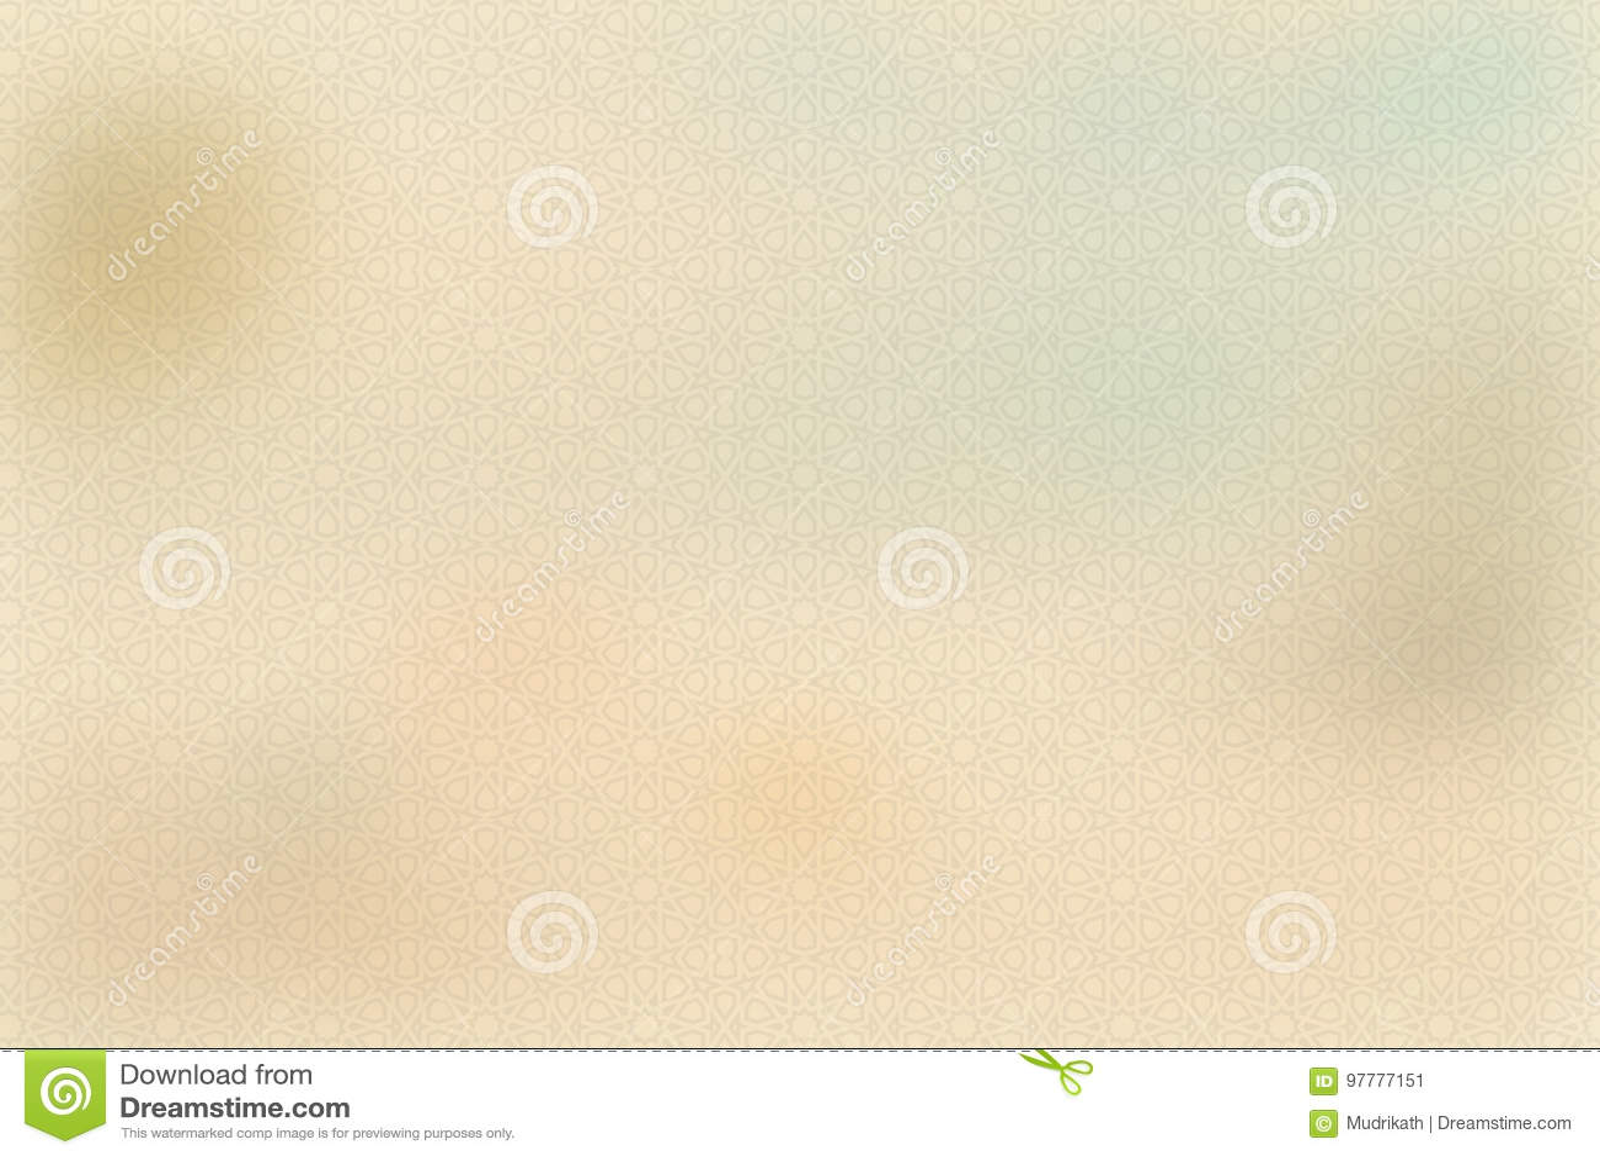 Yellow vintage cream or beige color parchment paper for Brown beige paint color